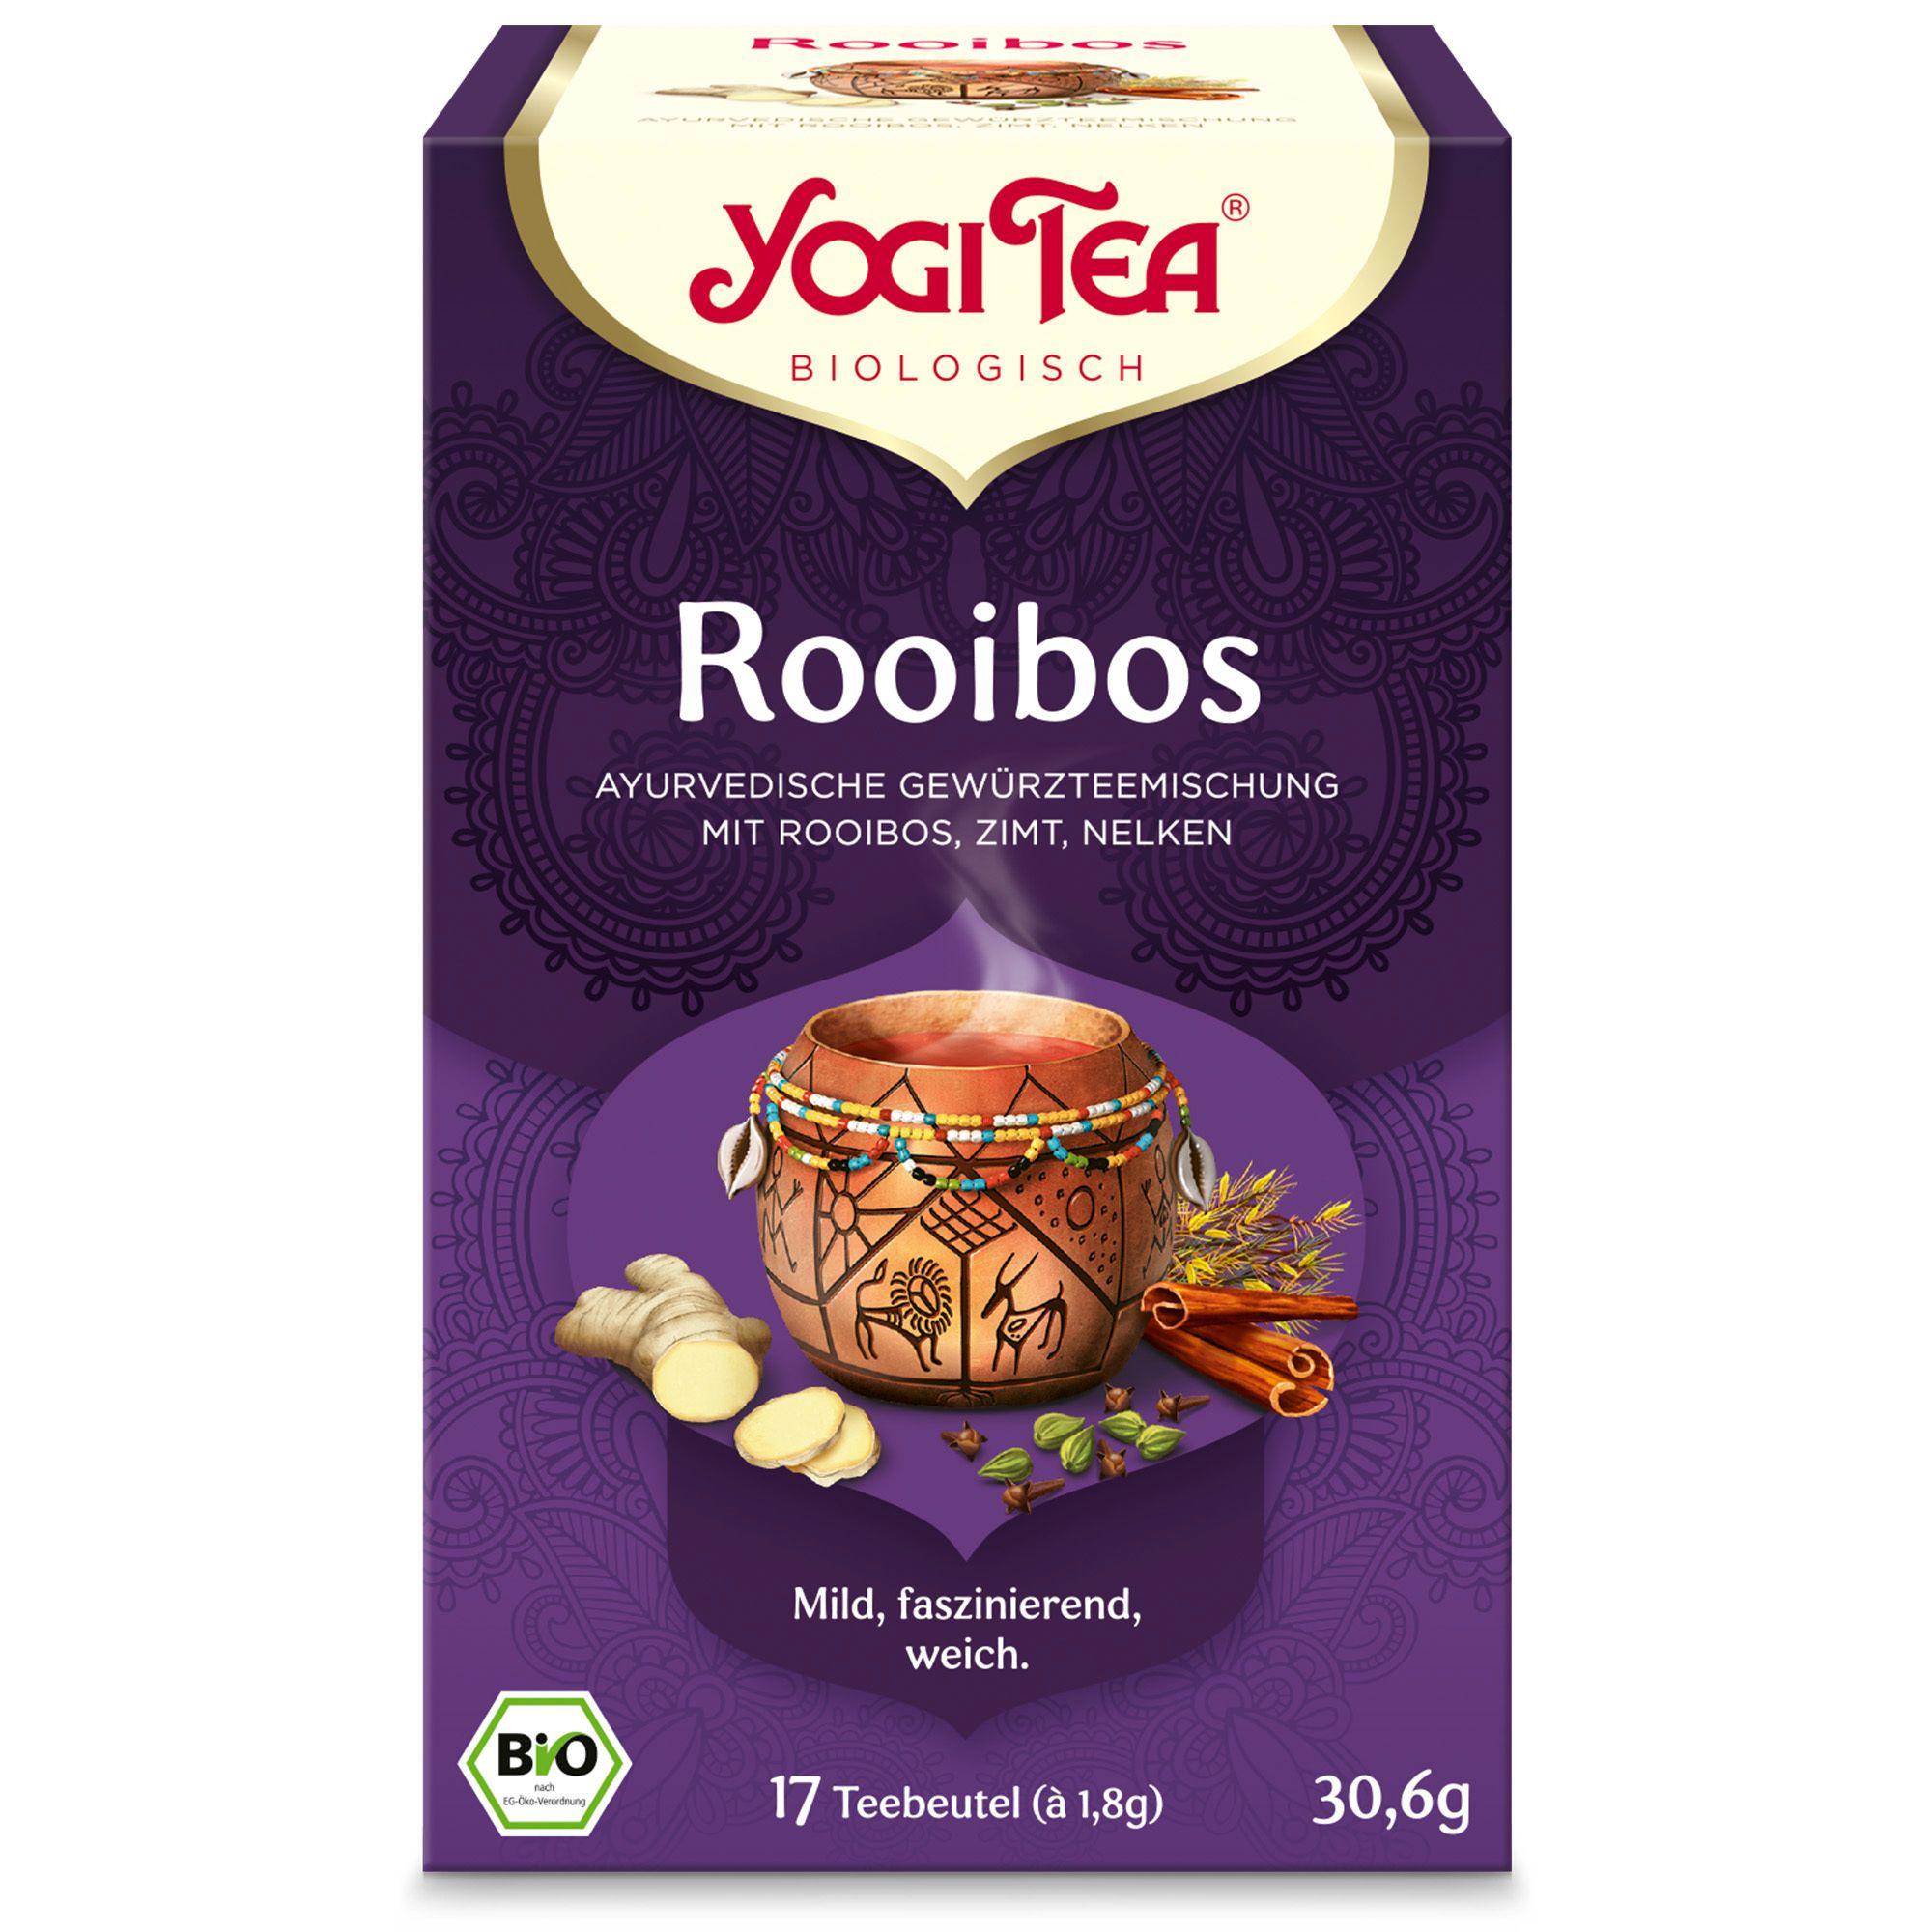 Yogi Tea® Rooibos